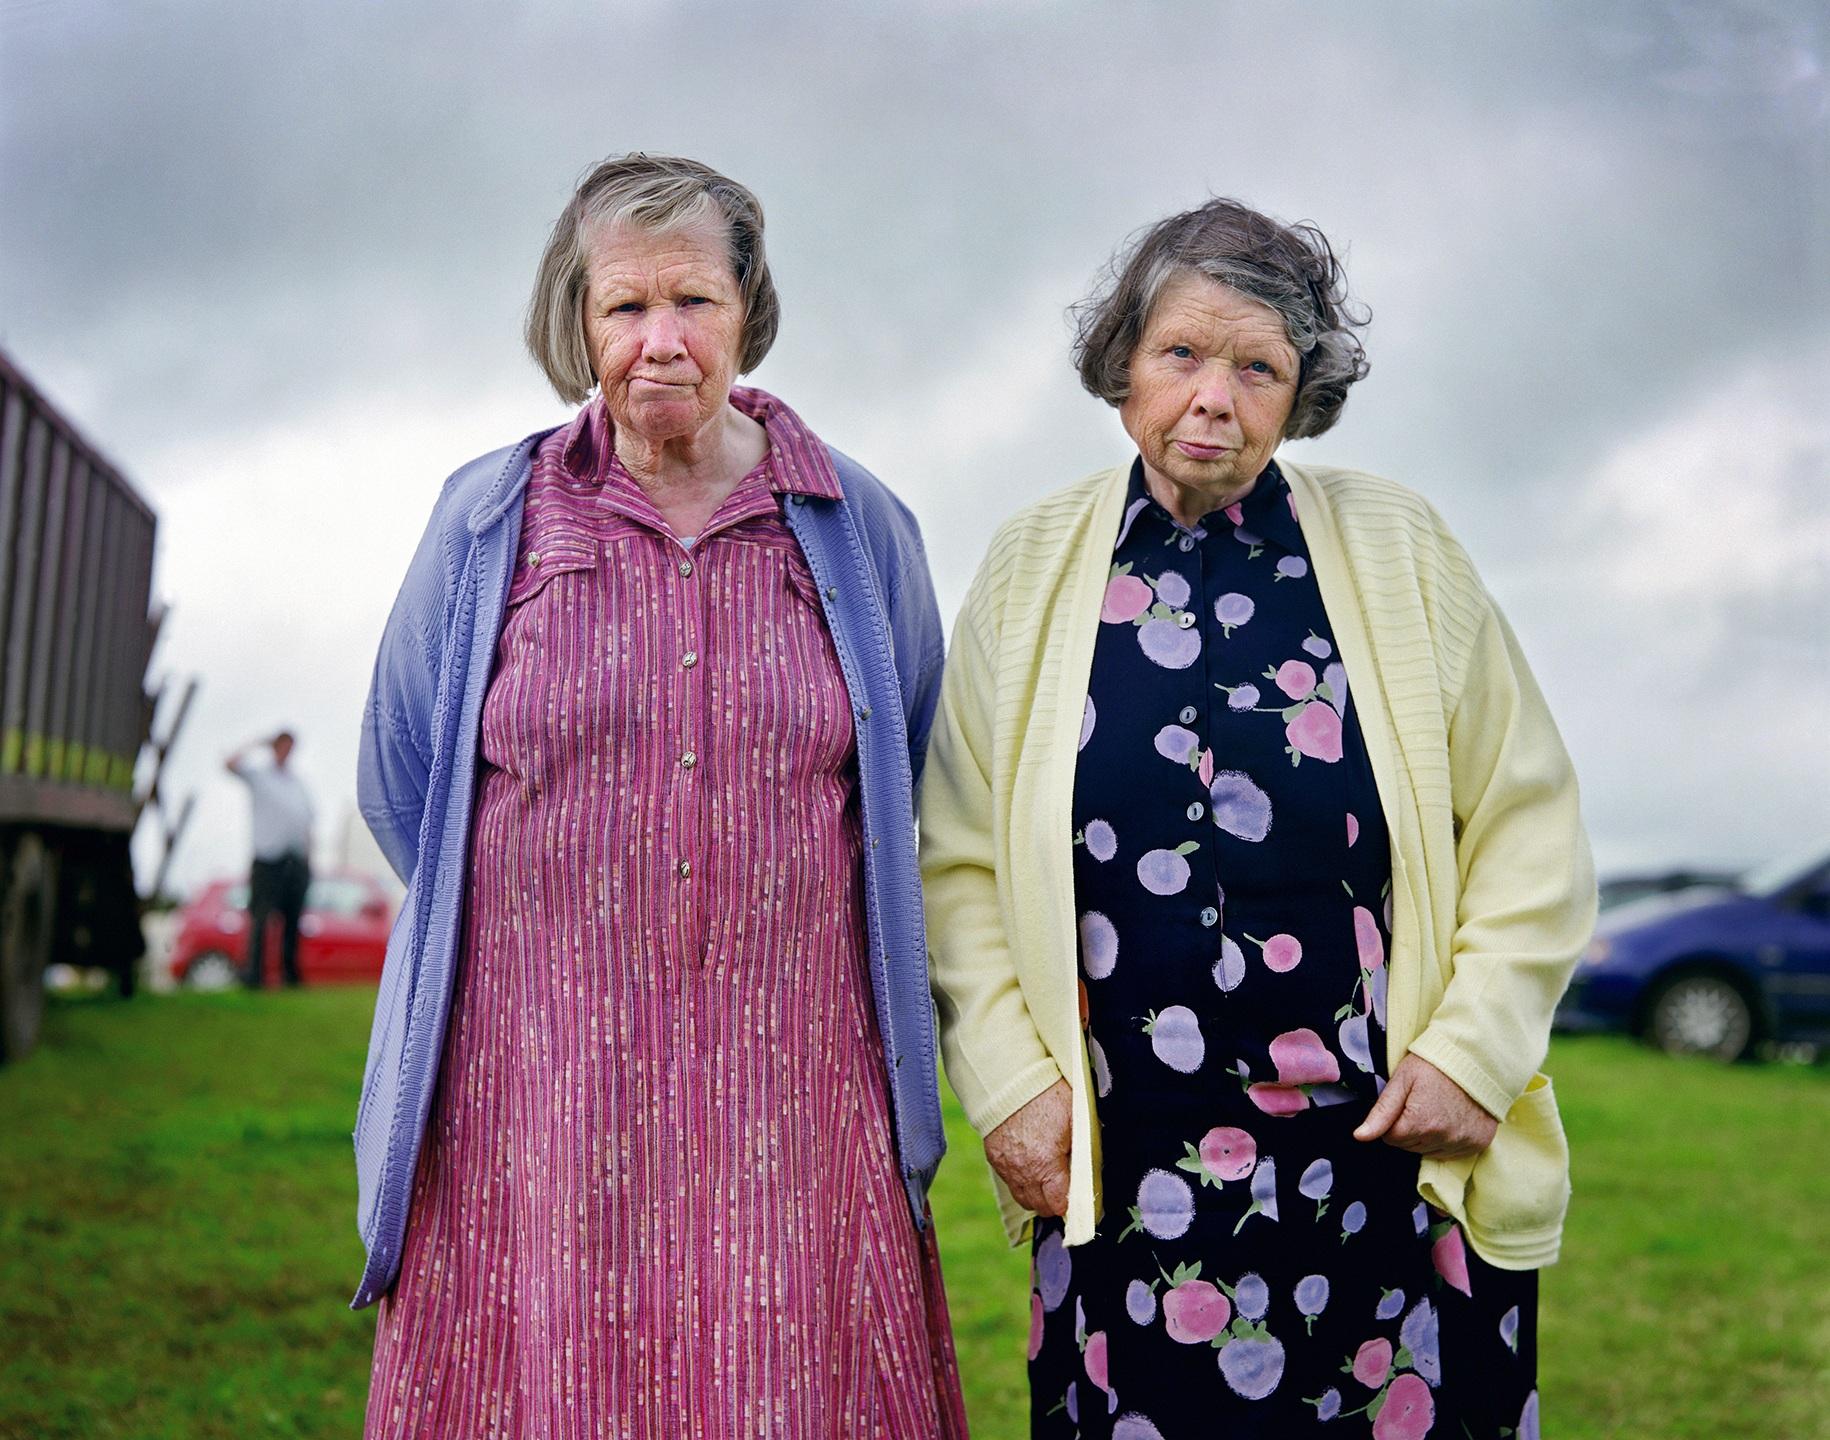 3. nagroda w kategorii Portrety - reportaż: Kenneth O'Halloran, Irlandia, Ireland Fairground public